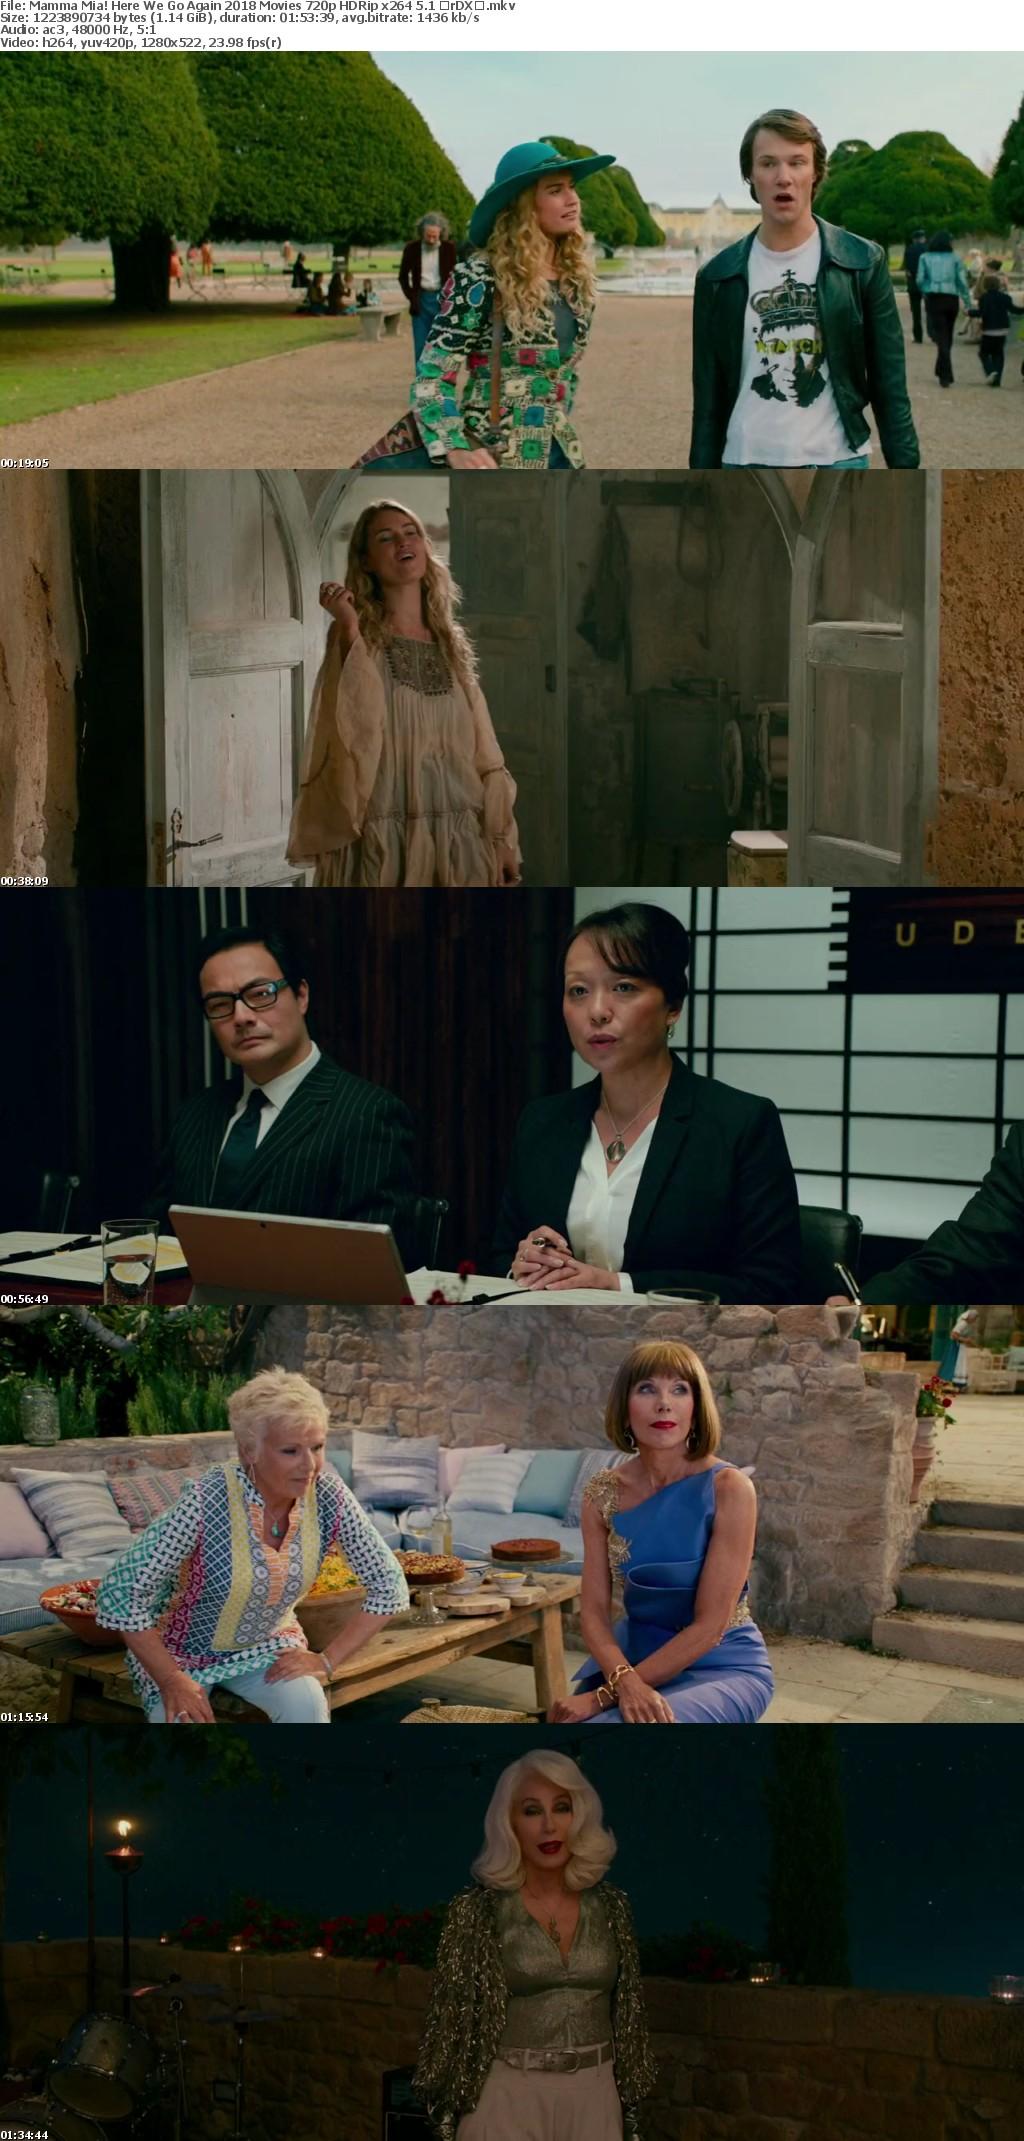 Mamma Mia! Here We Go Again 2018 Movies 720p HDRip x264 5 1 with Sample